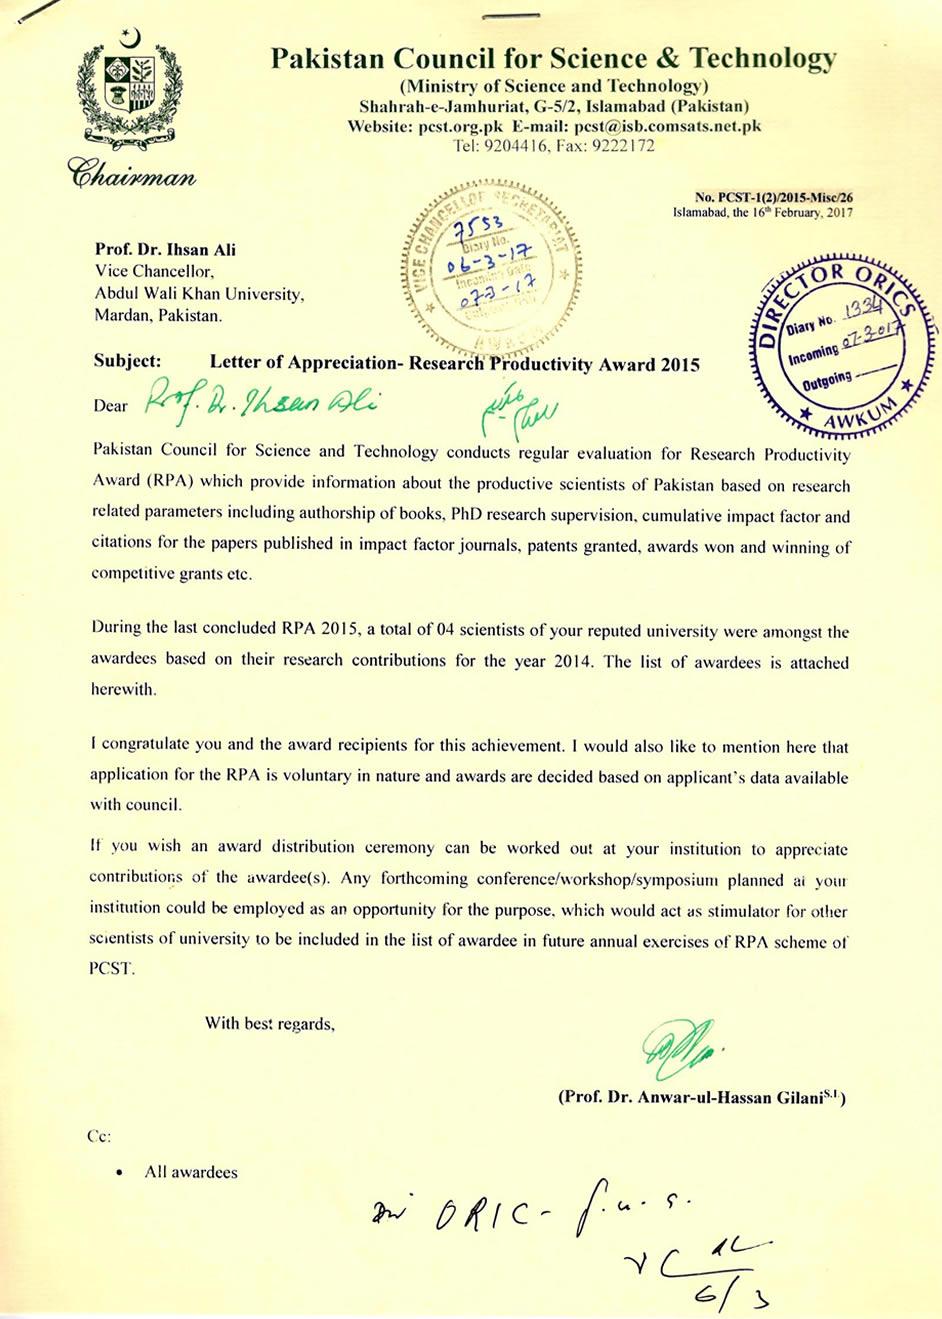 Abdul wali khan university mardan letter of appreciation research letter of appreciation research productivity award 2015 spiritdancerdesigns Image collections